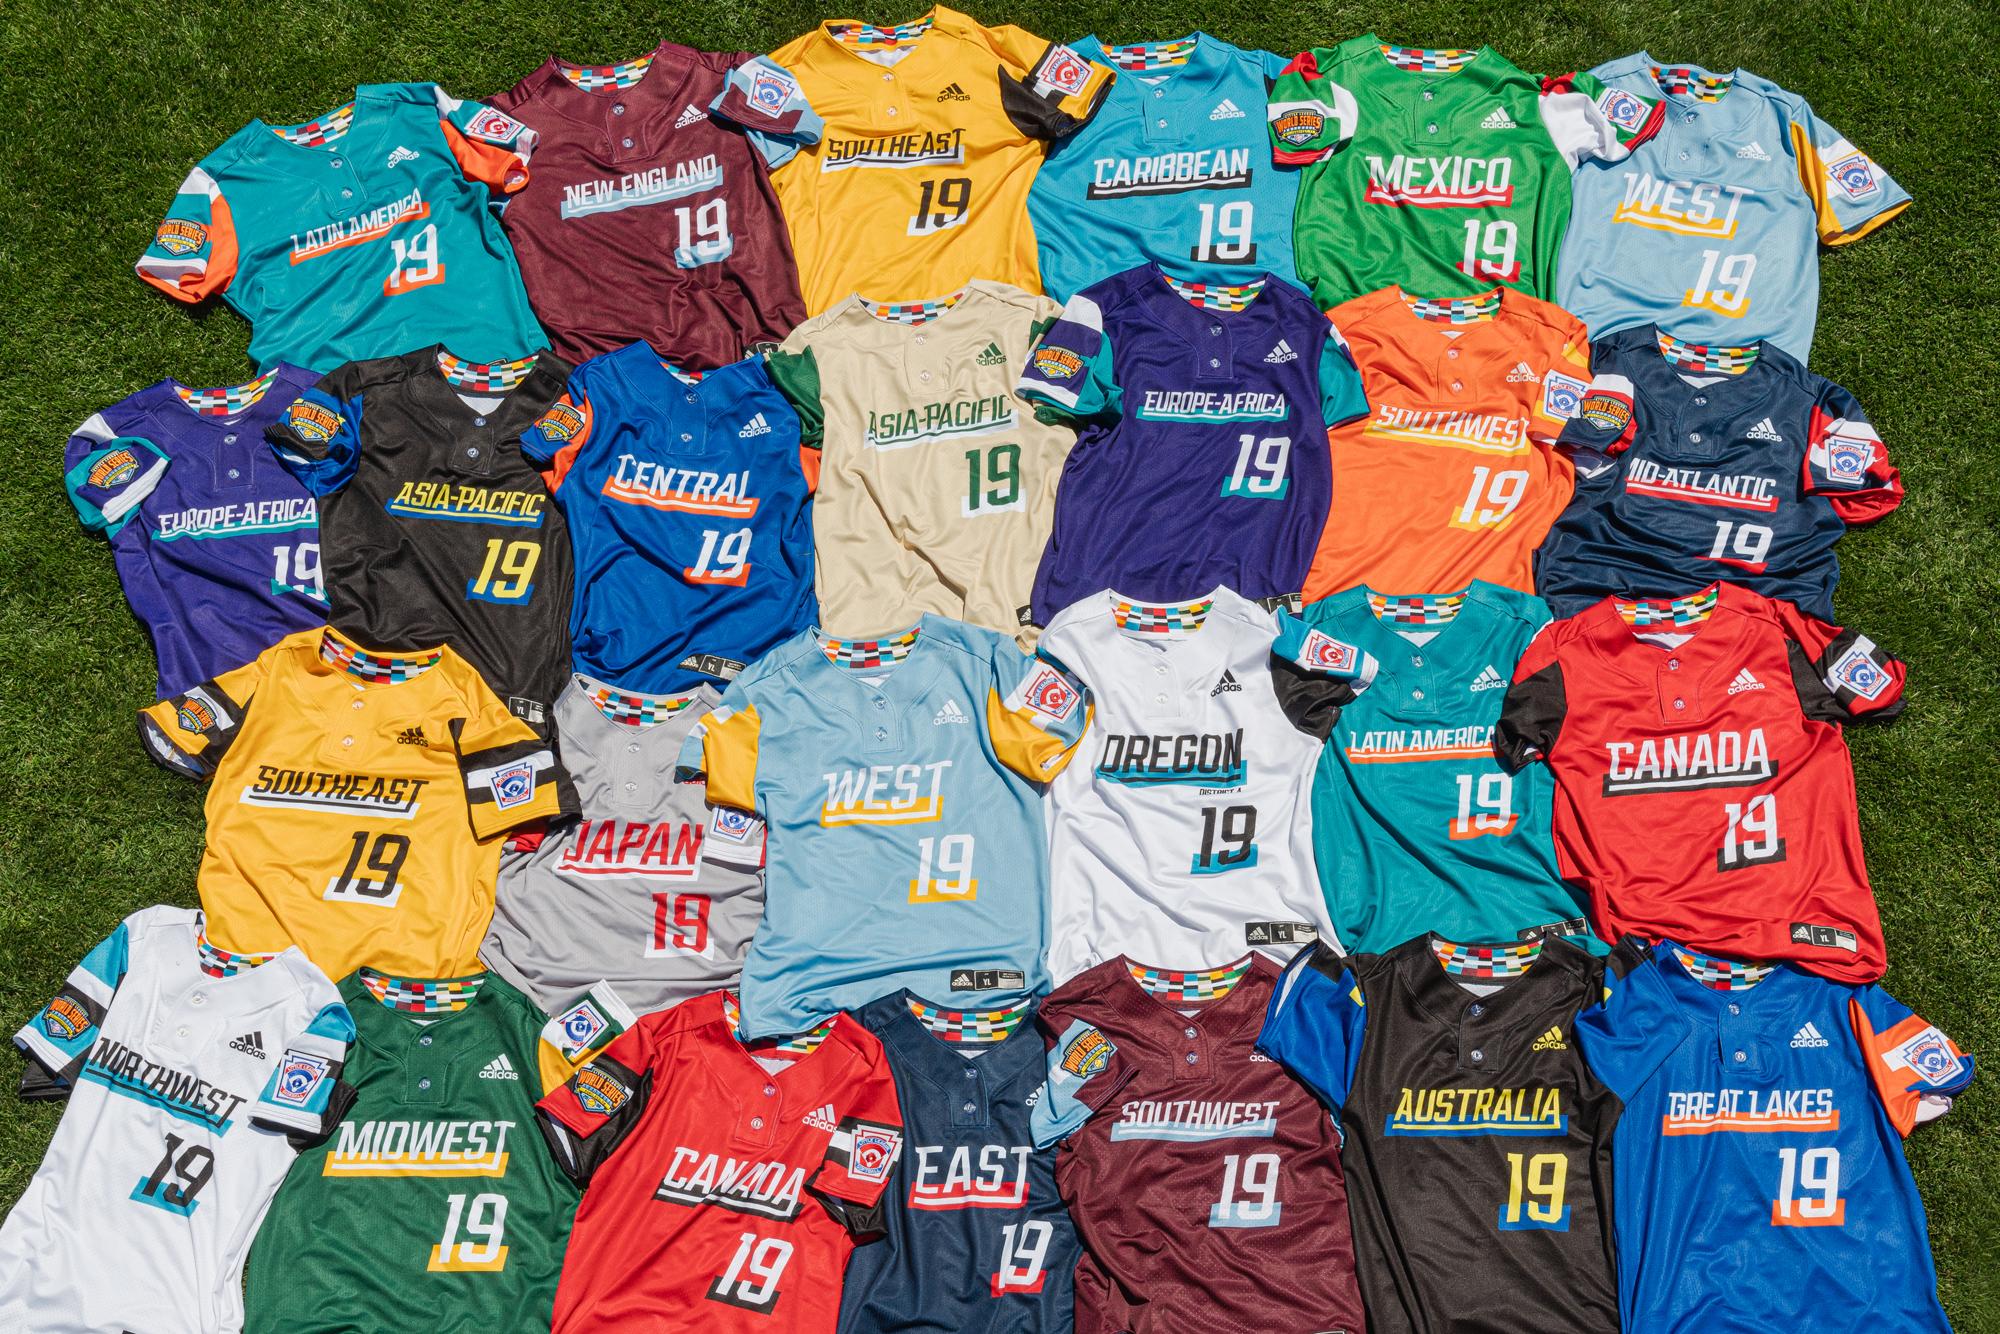 9da0cabda adidas and Little League® Unveil Uniforms for the 2019 Little League  Baseball & Softball World Series Tournaments - Little League